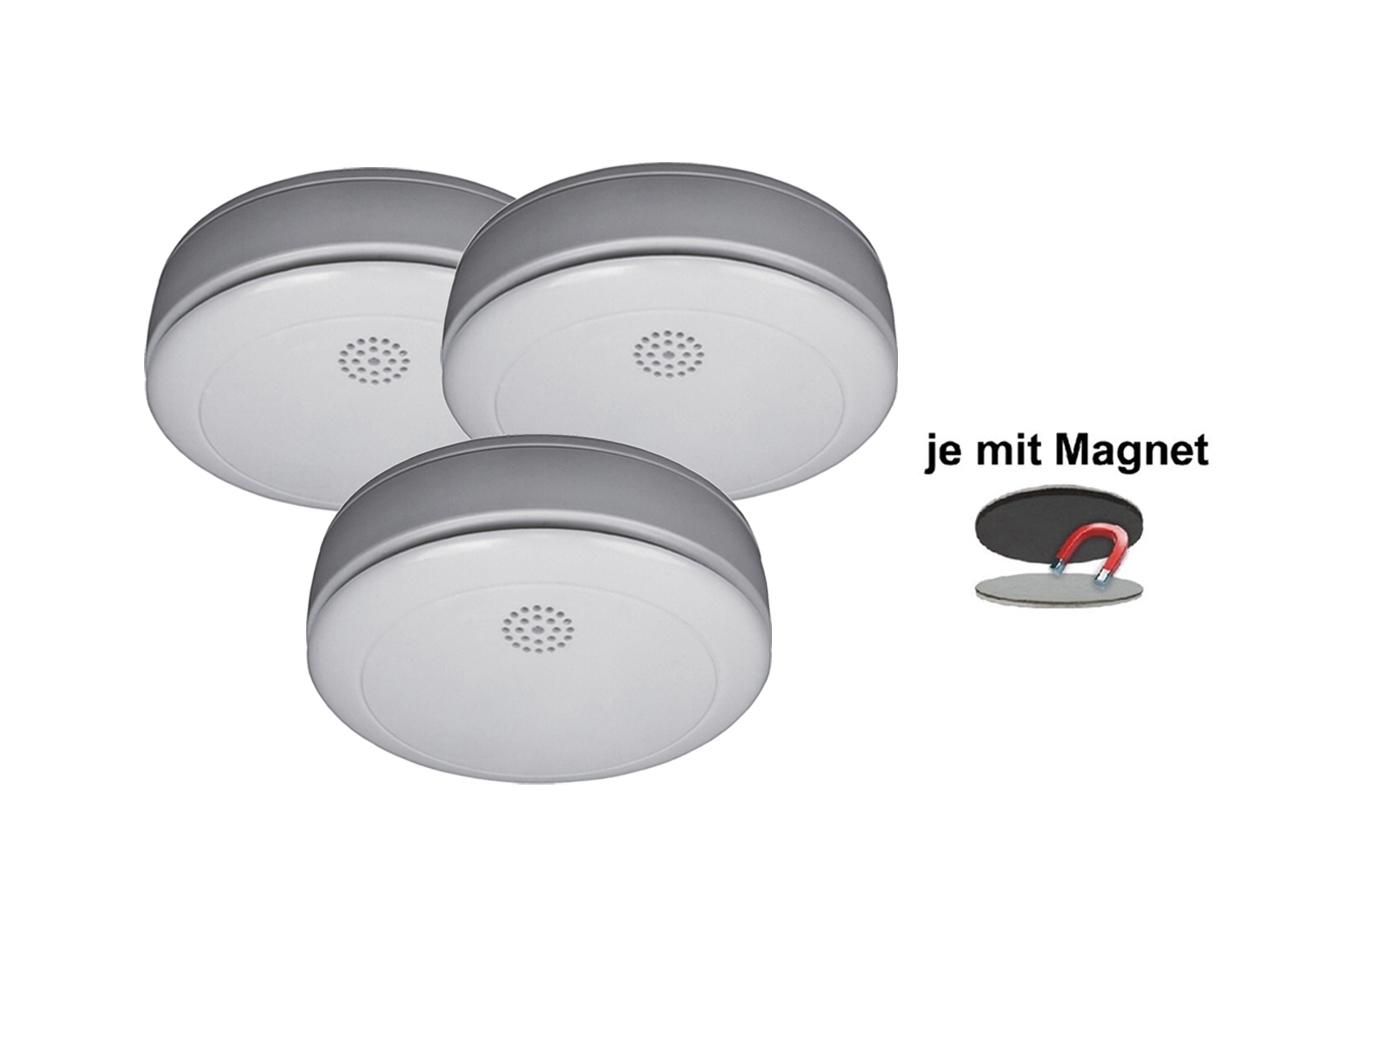 3er sparset rauchmelder mit 10 jahres batterie. Black Bedroom Furniture Sets. Home Design Ideas